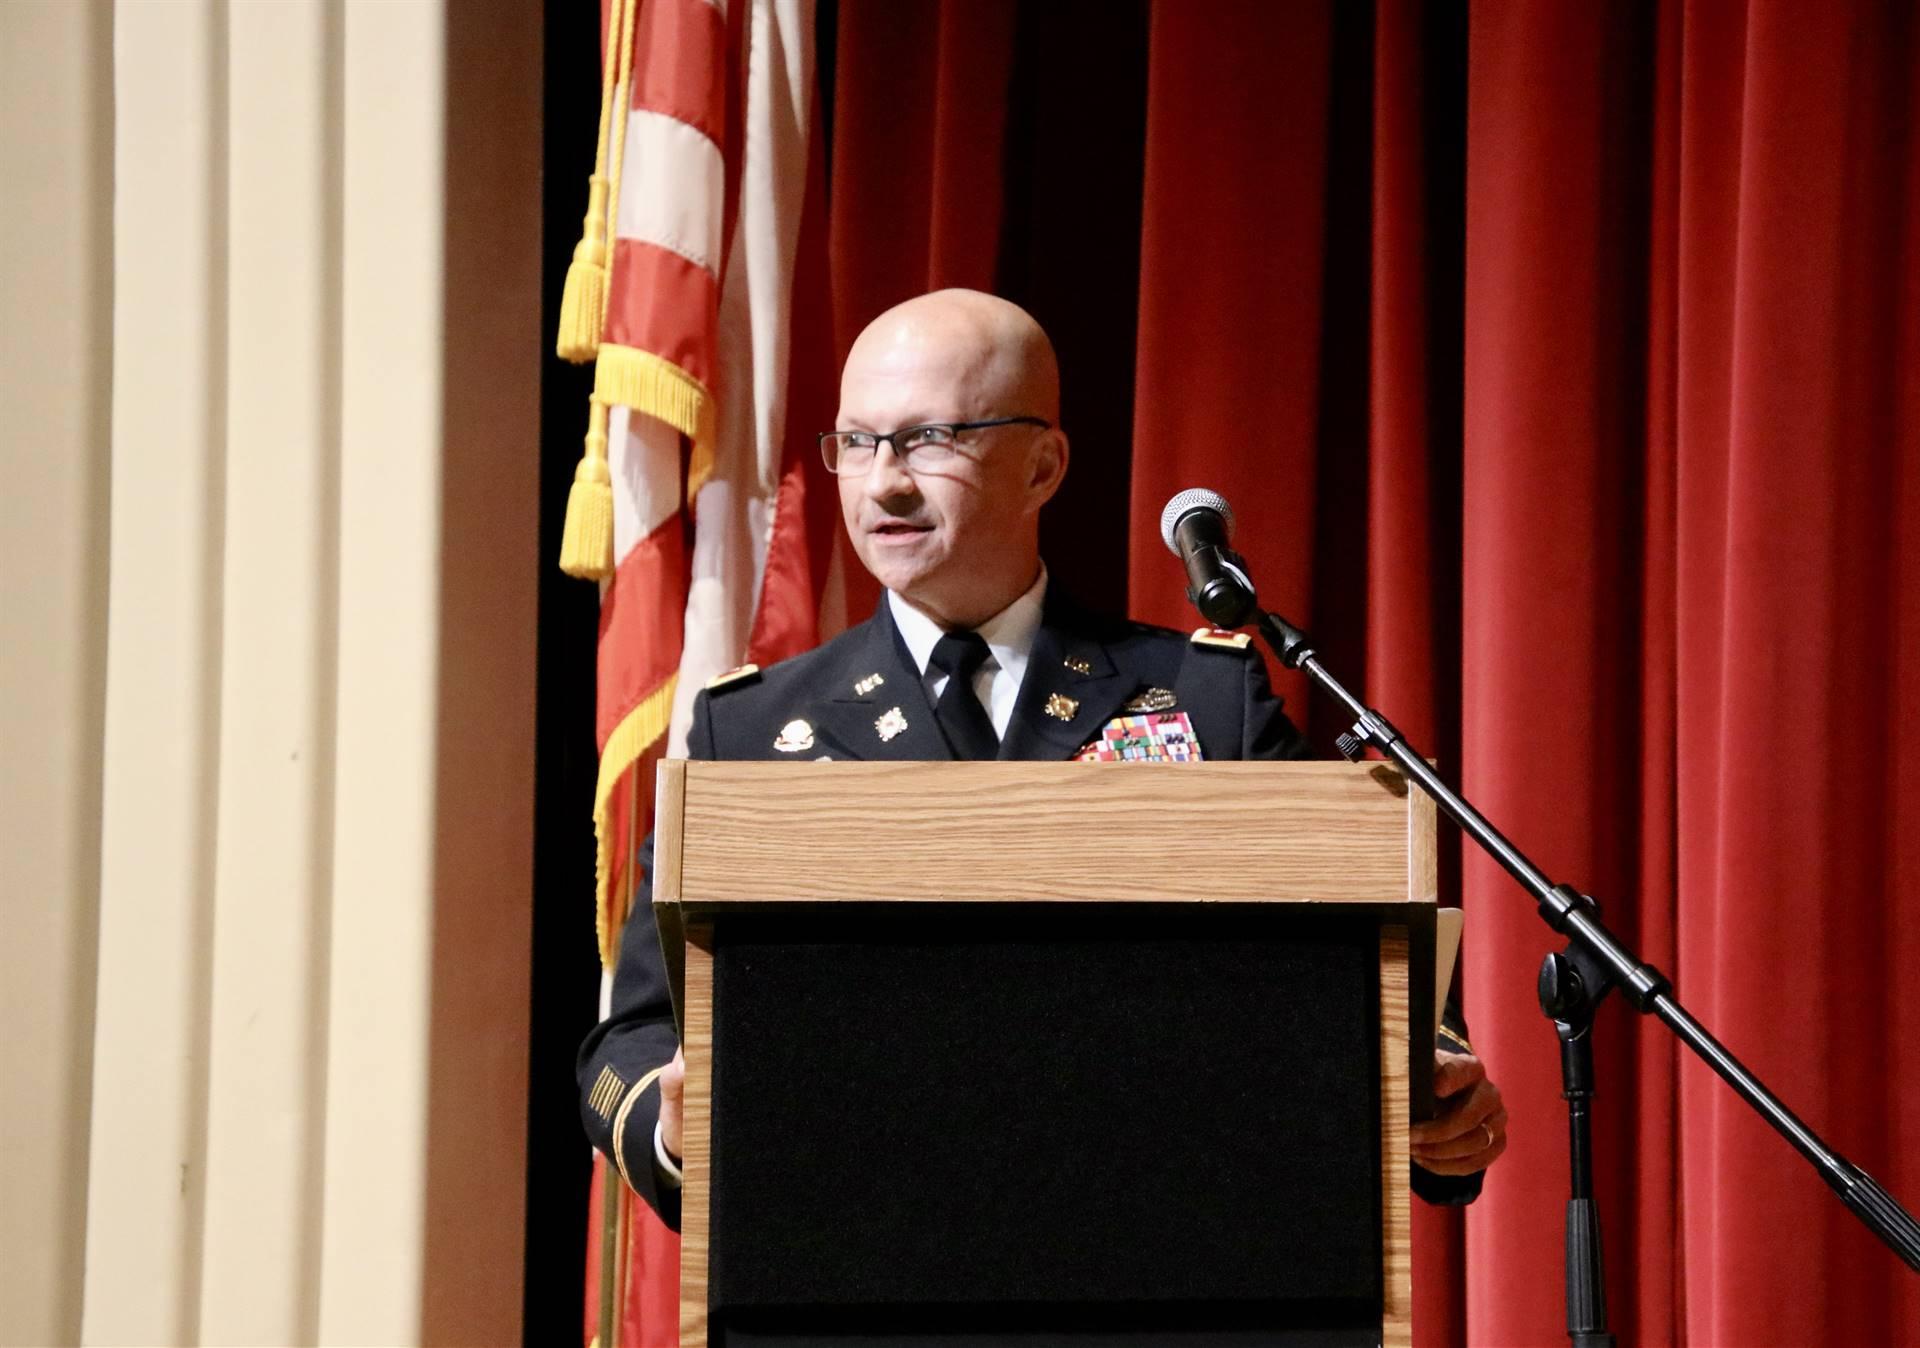 Hall of Distinction honoree - Redding presenting